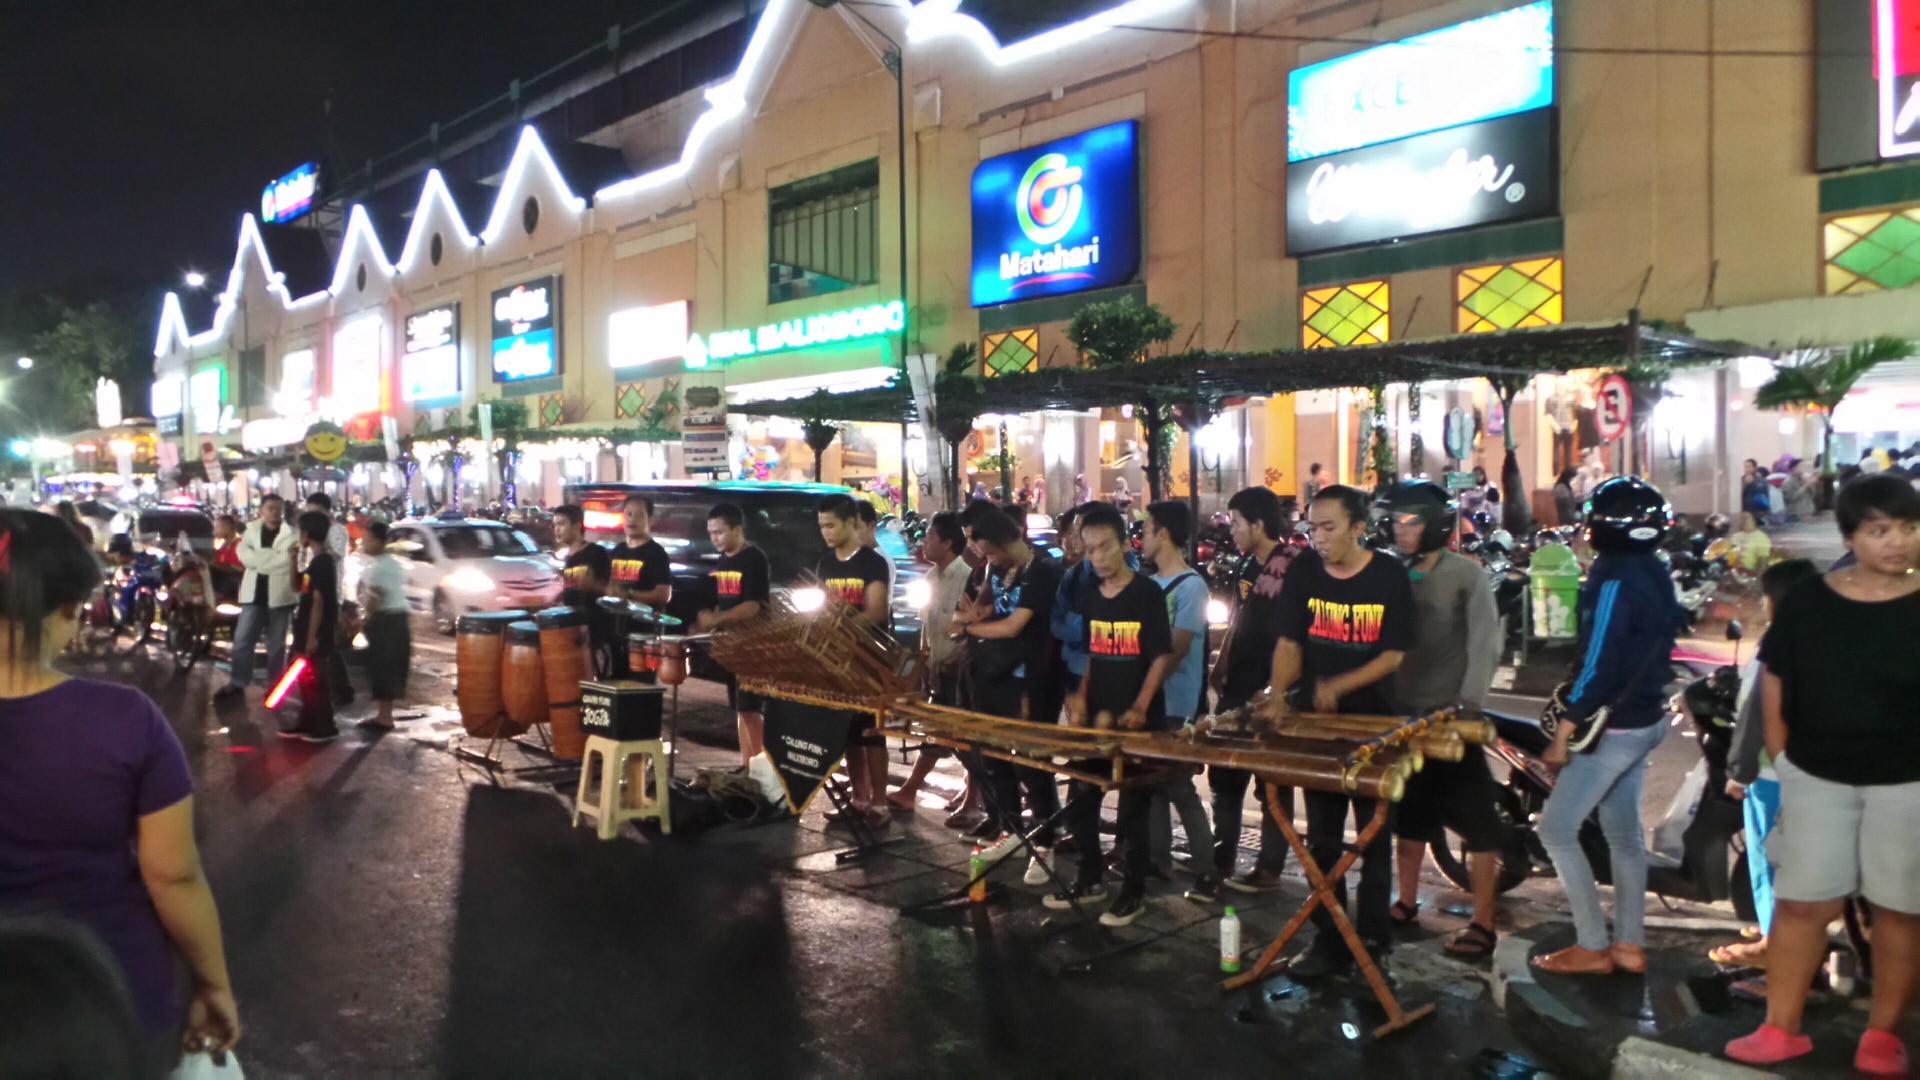 Wisata Jogja - Jalan Malioboro - Aneka Tempat Wisata ce8aef0d83